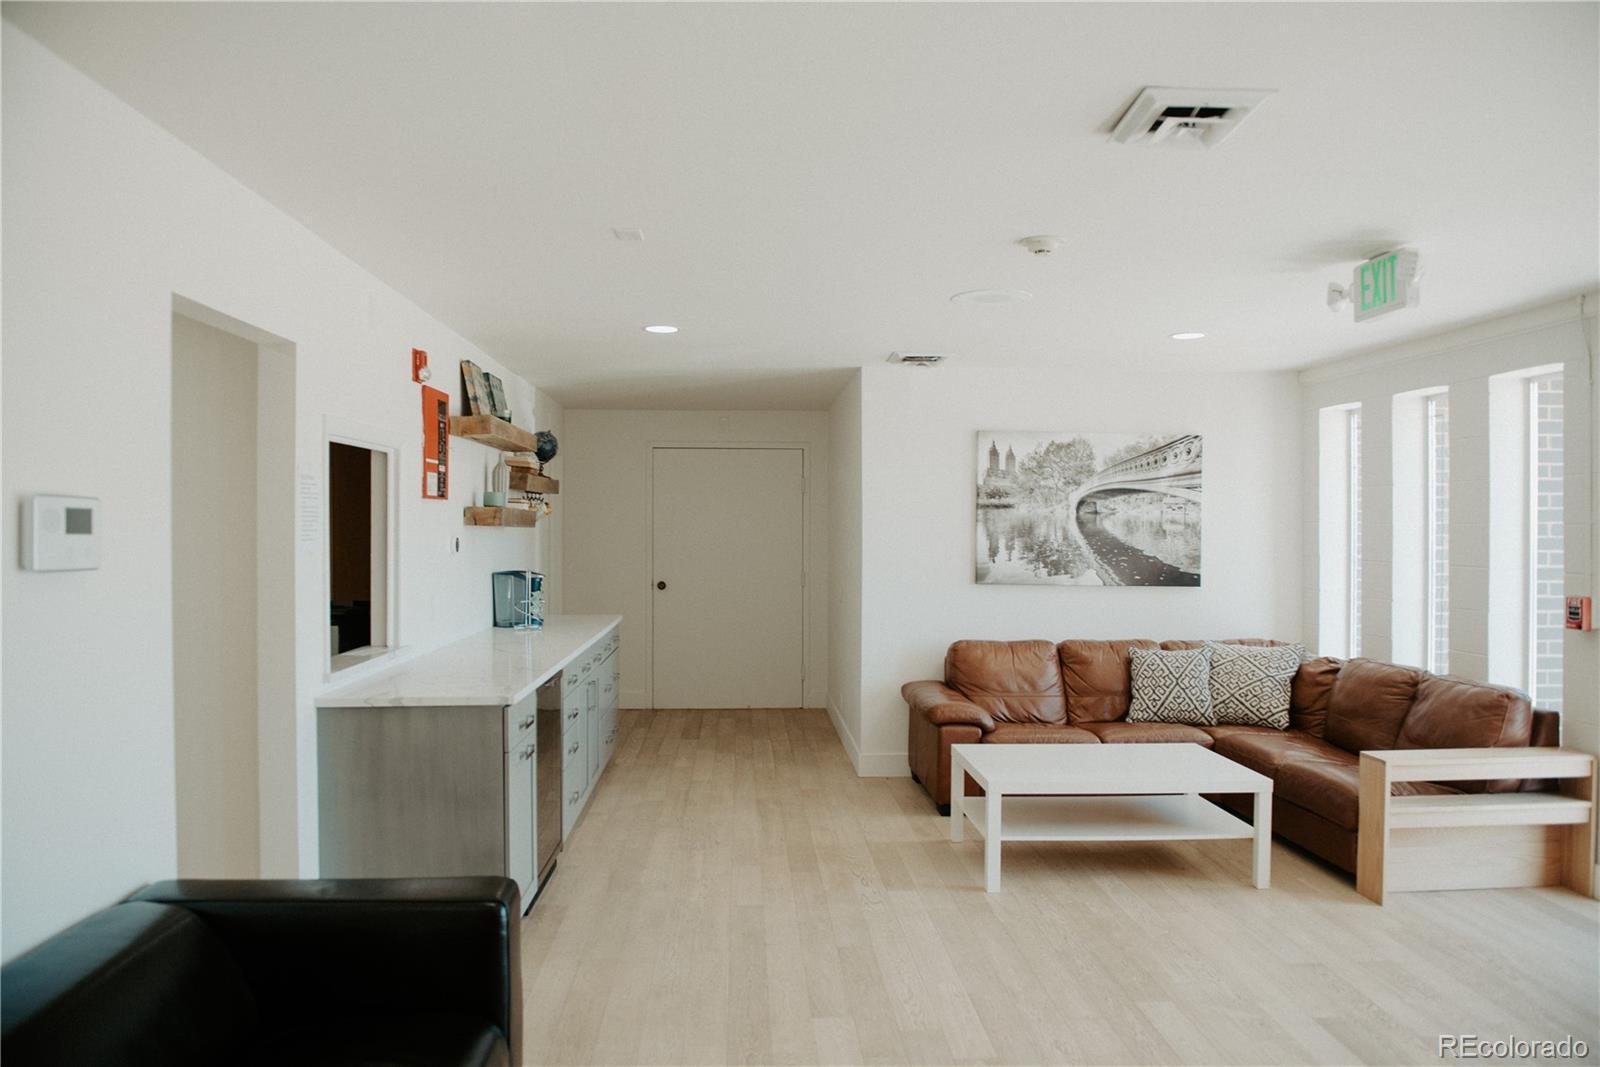 1701 Wadsworth Boulevard, Lakewood, CO 80214 - Lakewood, CO real estate listing